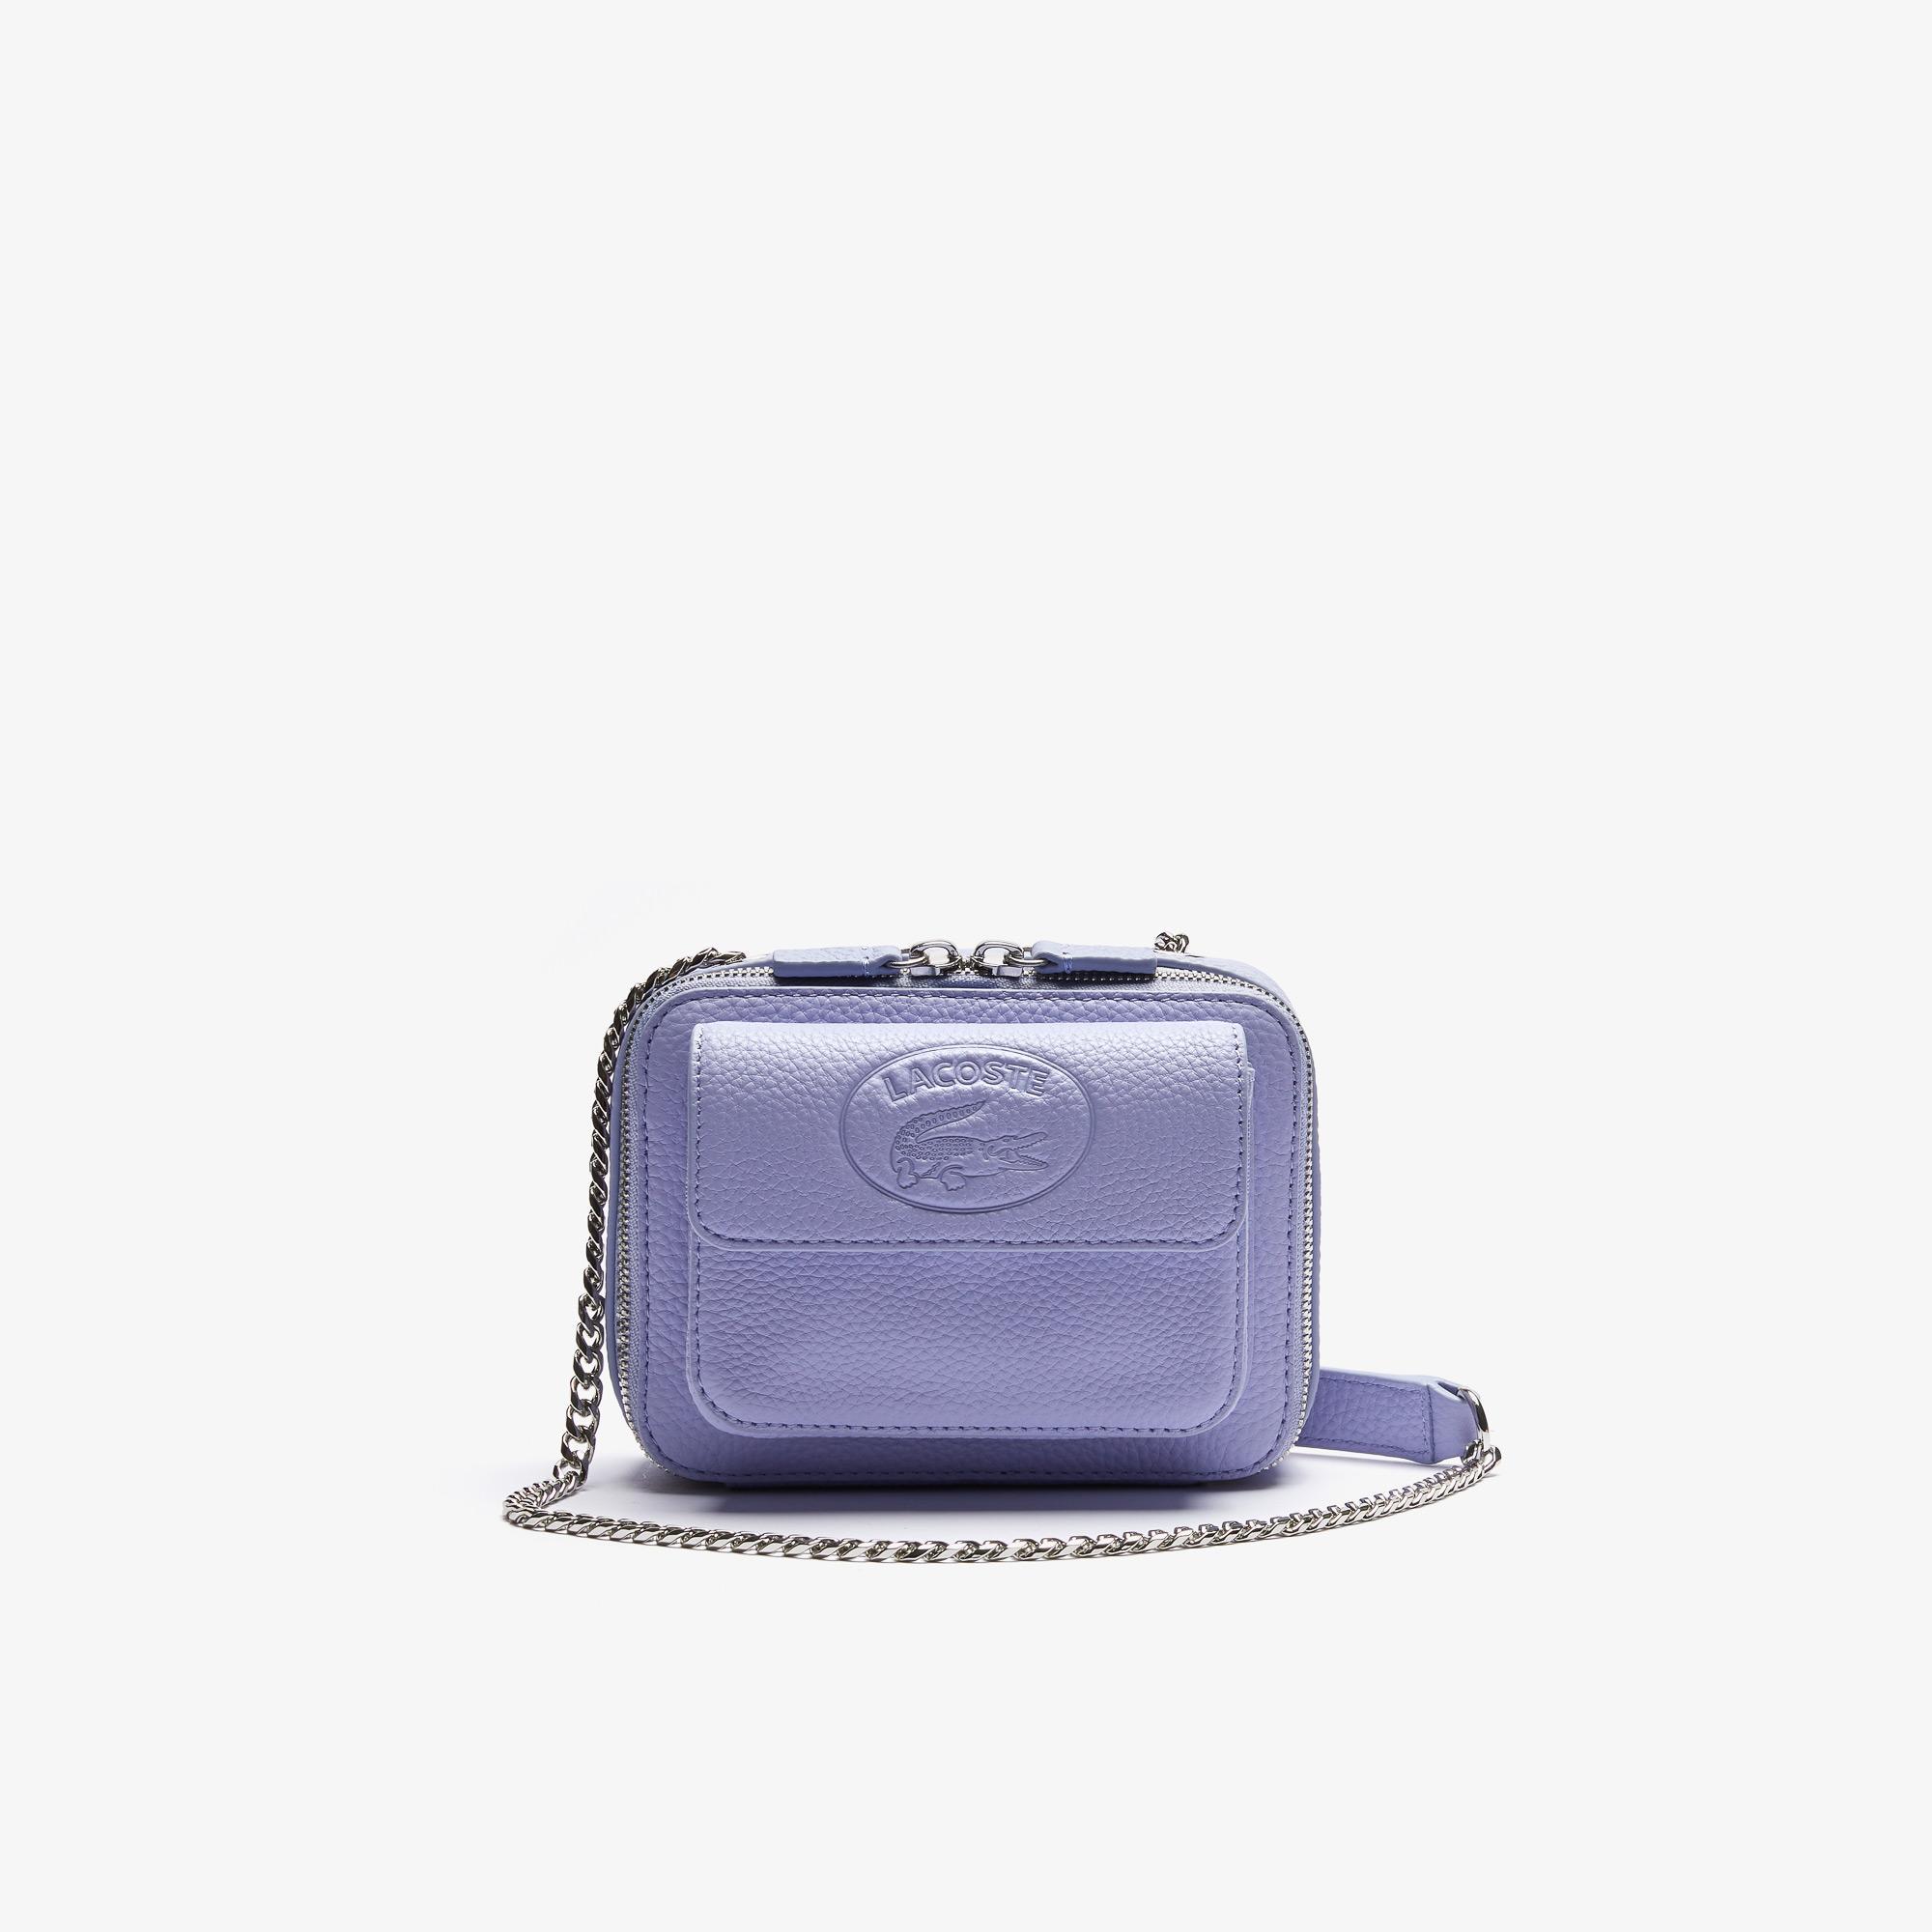 Lacoste Women's Croco Crew Grained Leather Zip Mini Shoulder Bag